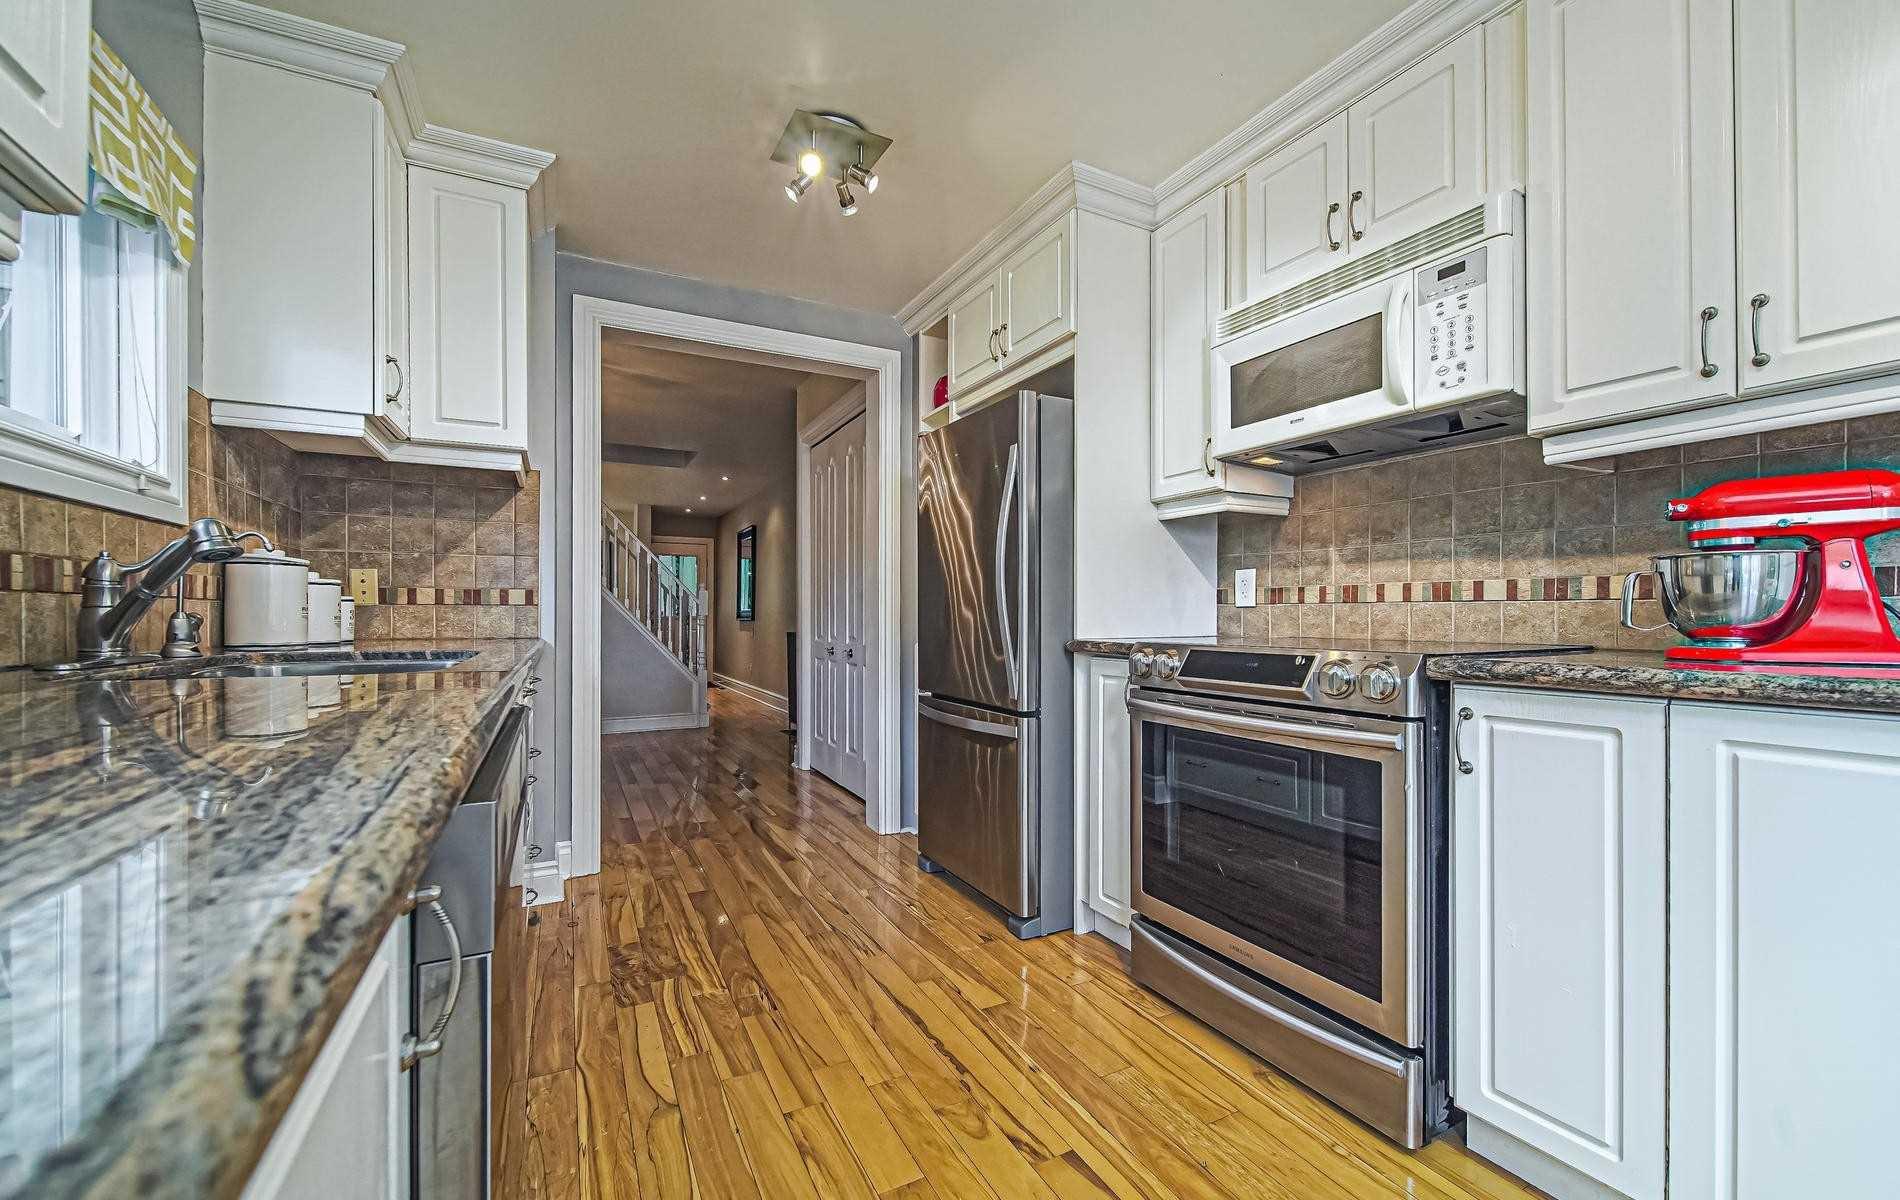 Photo 7: Photos: 84 Rushbrooke Avenue in Toronto: South Riverdale House (2-Storey) for sale (Toronto E01)  : MLS®# E4600791